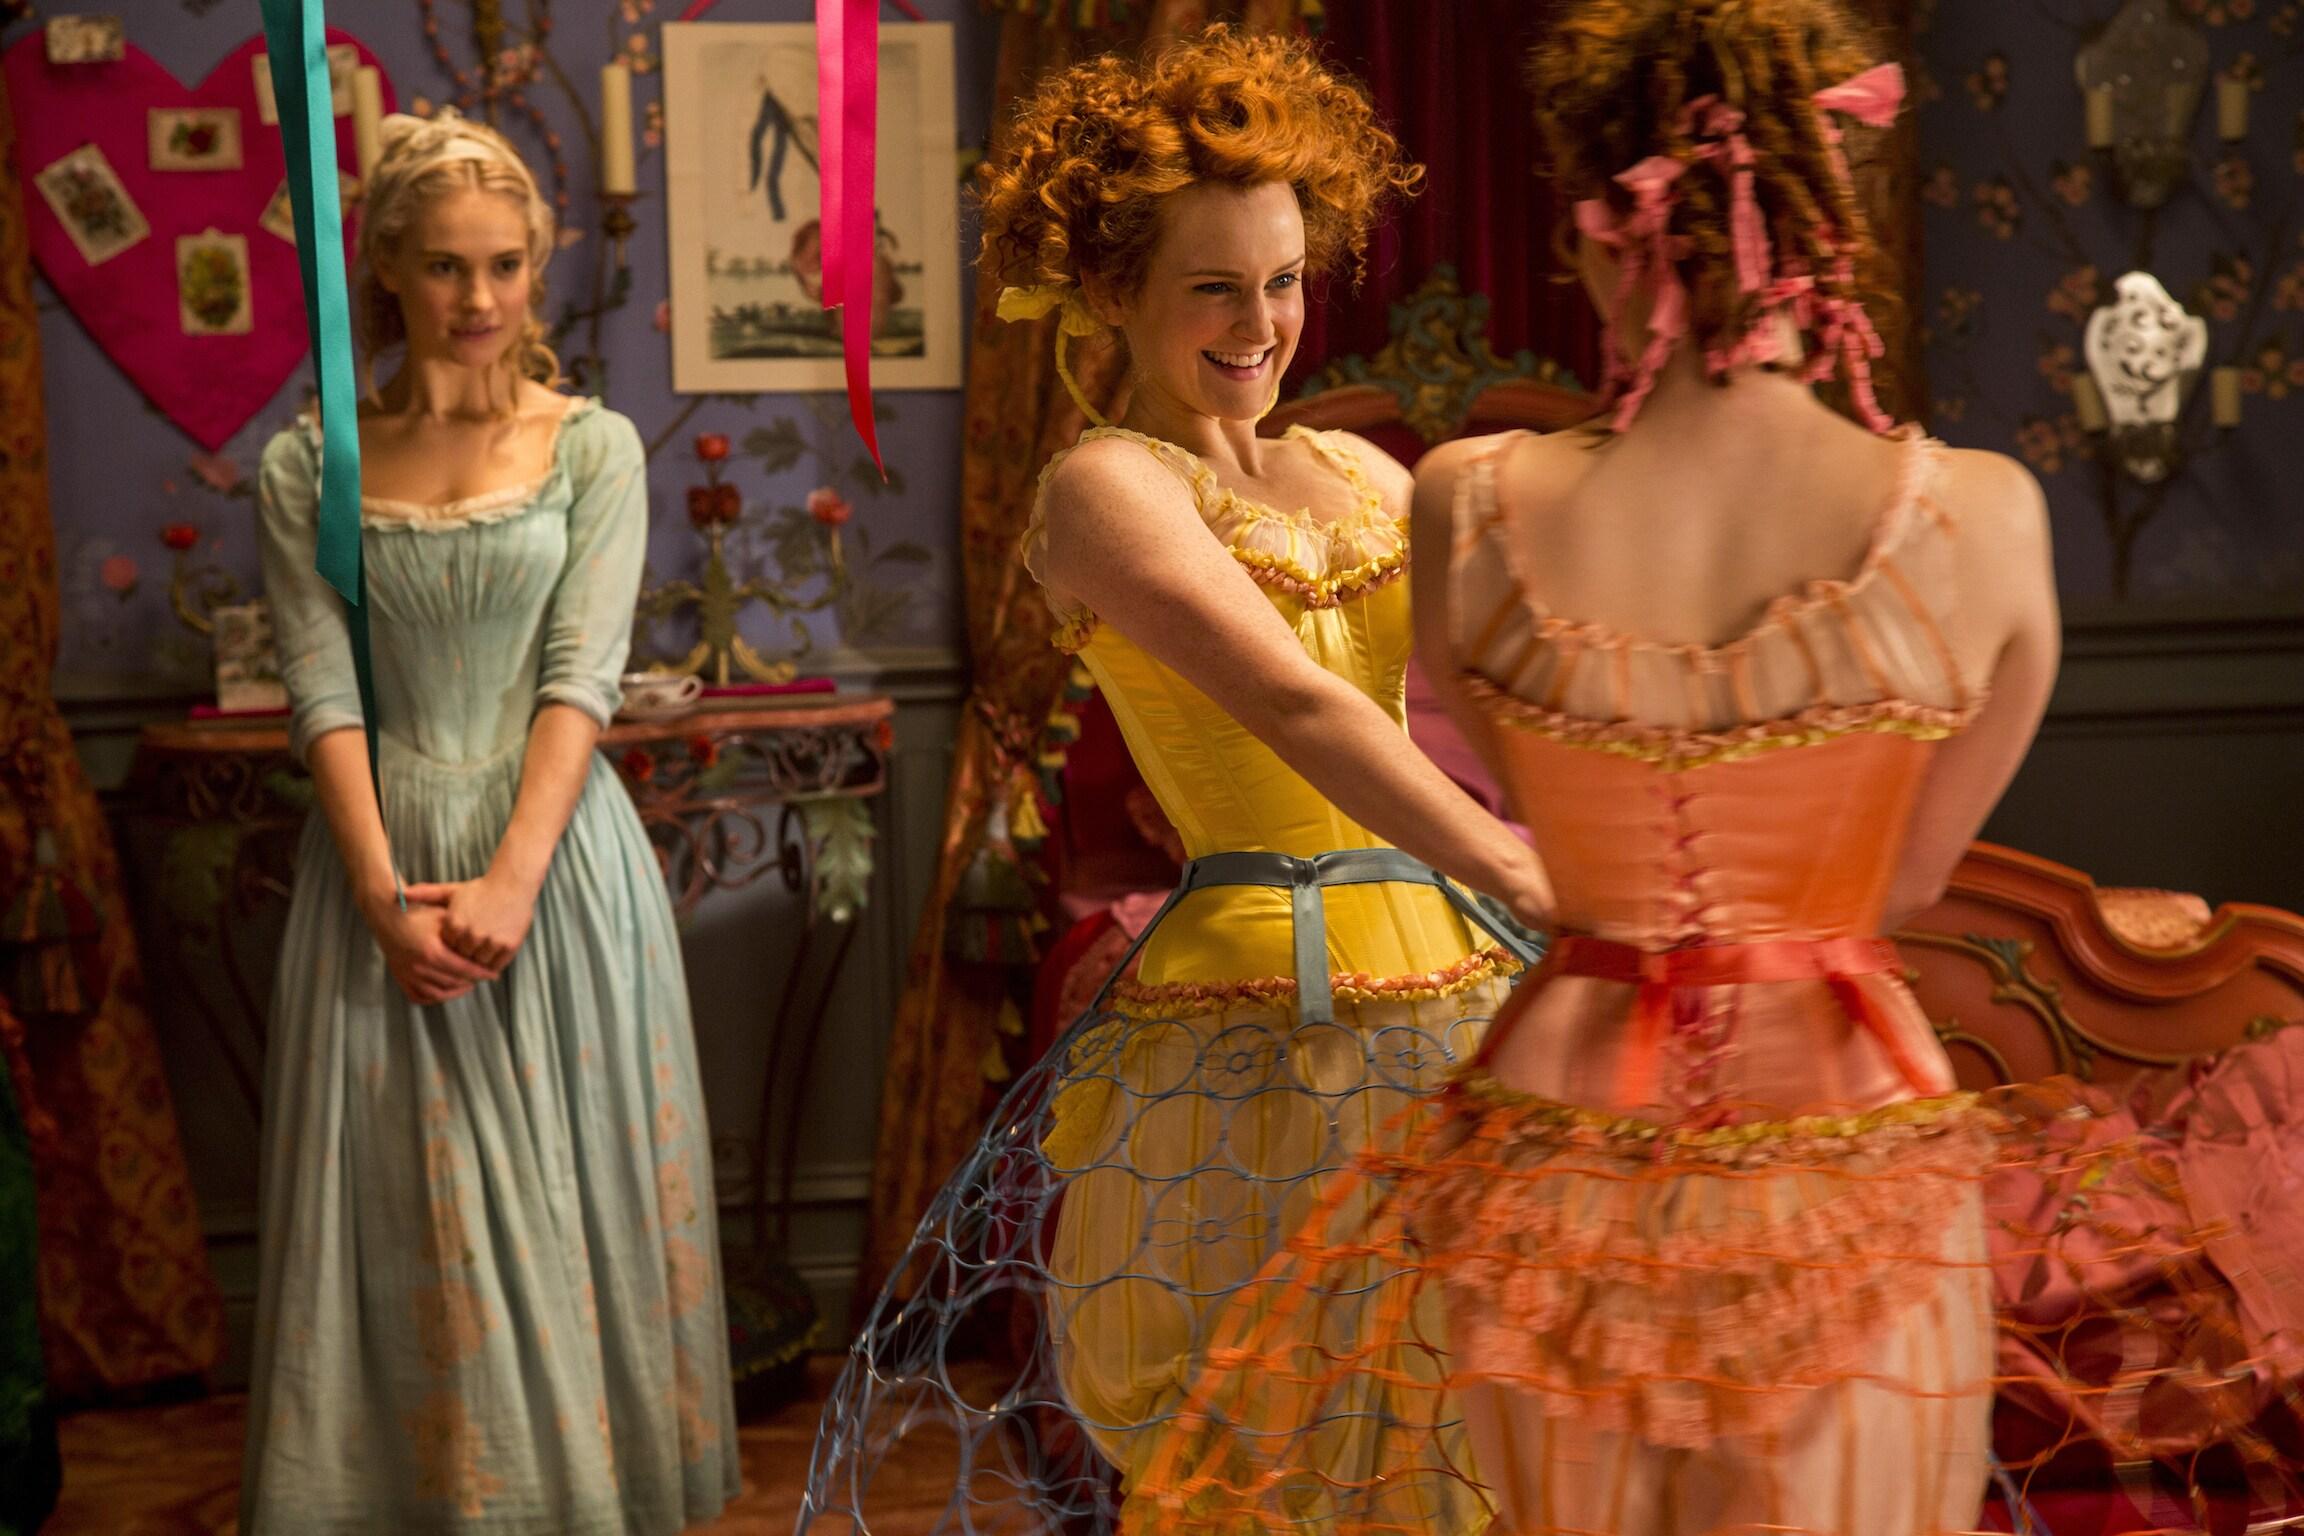 Actors Holliday Grainger (as Anastasia), Sophie McShera (as Drisella), and Lily James (as Cinderella) in the movie Cinderella.